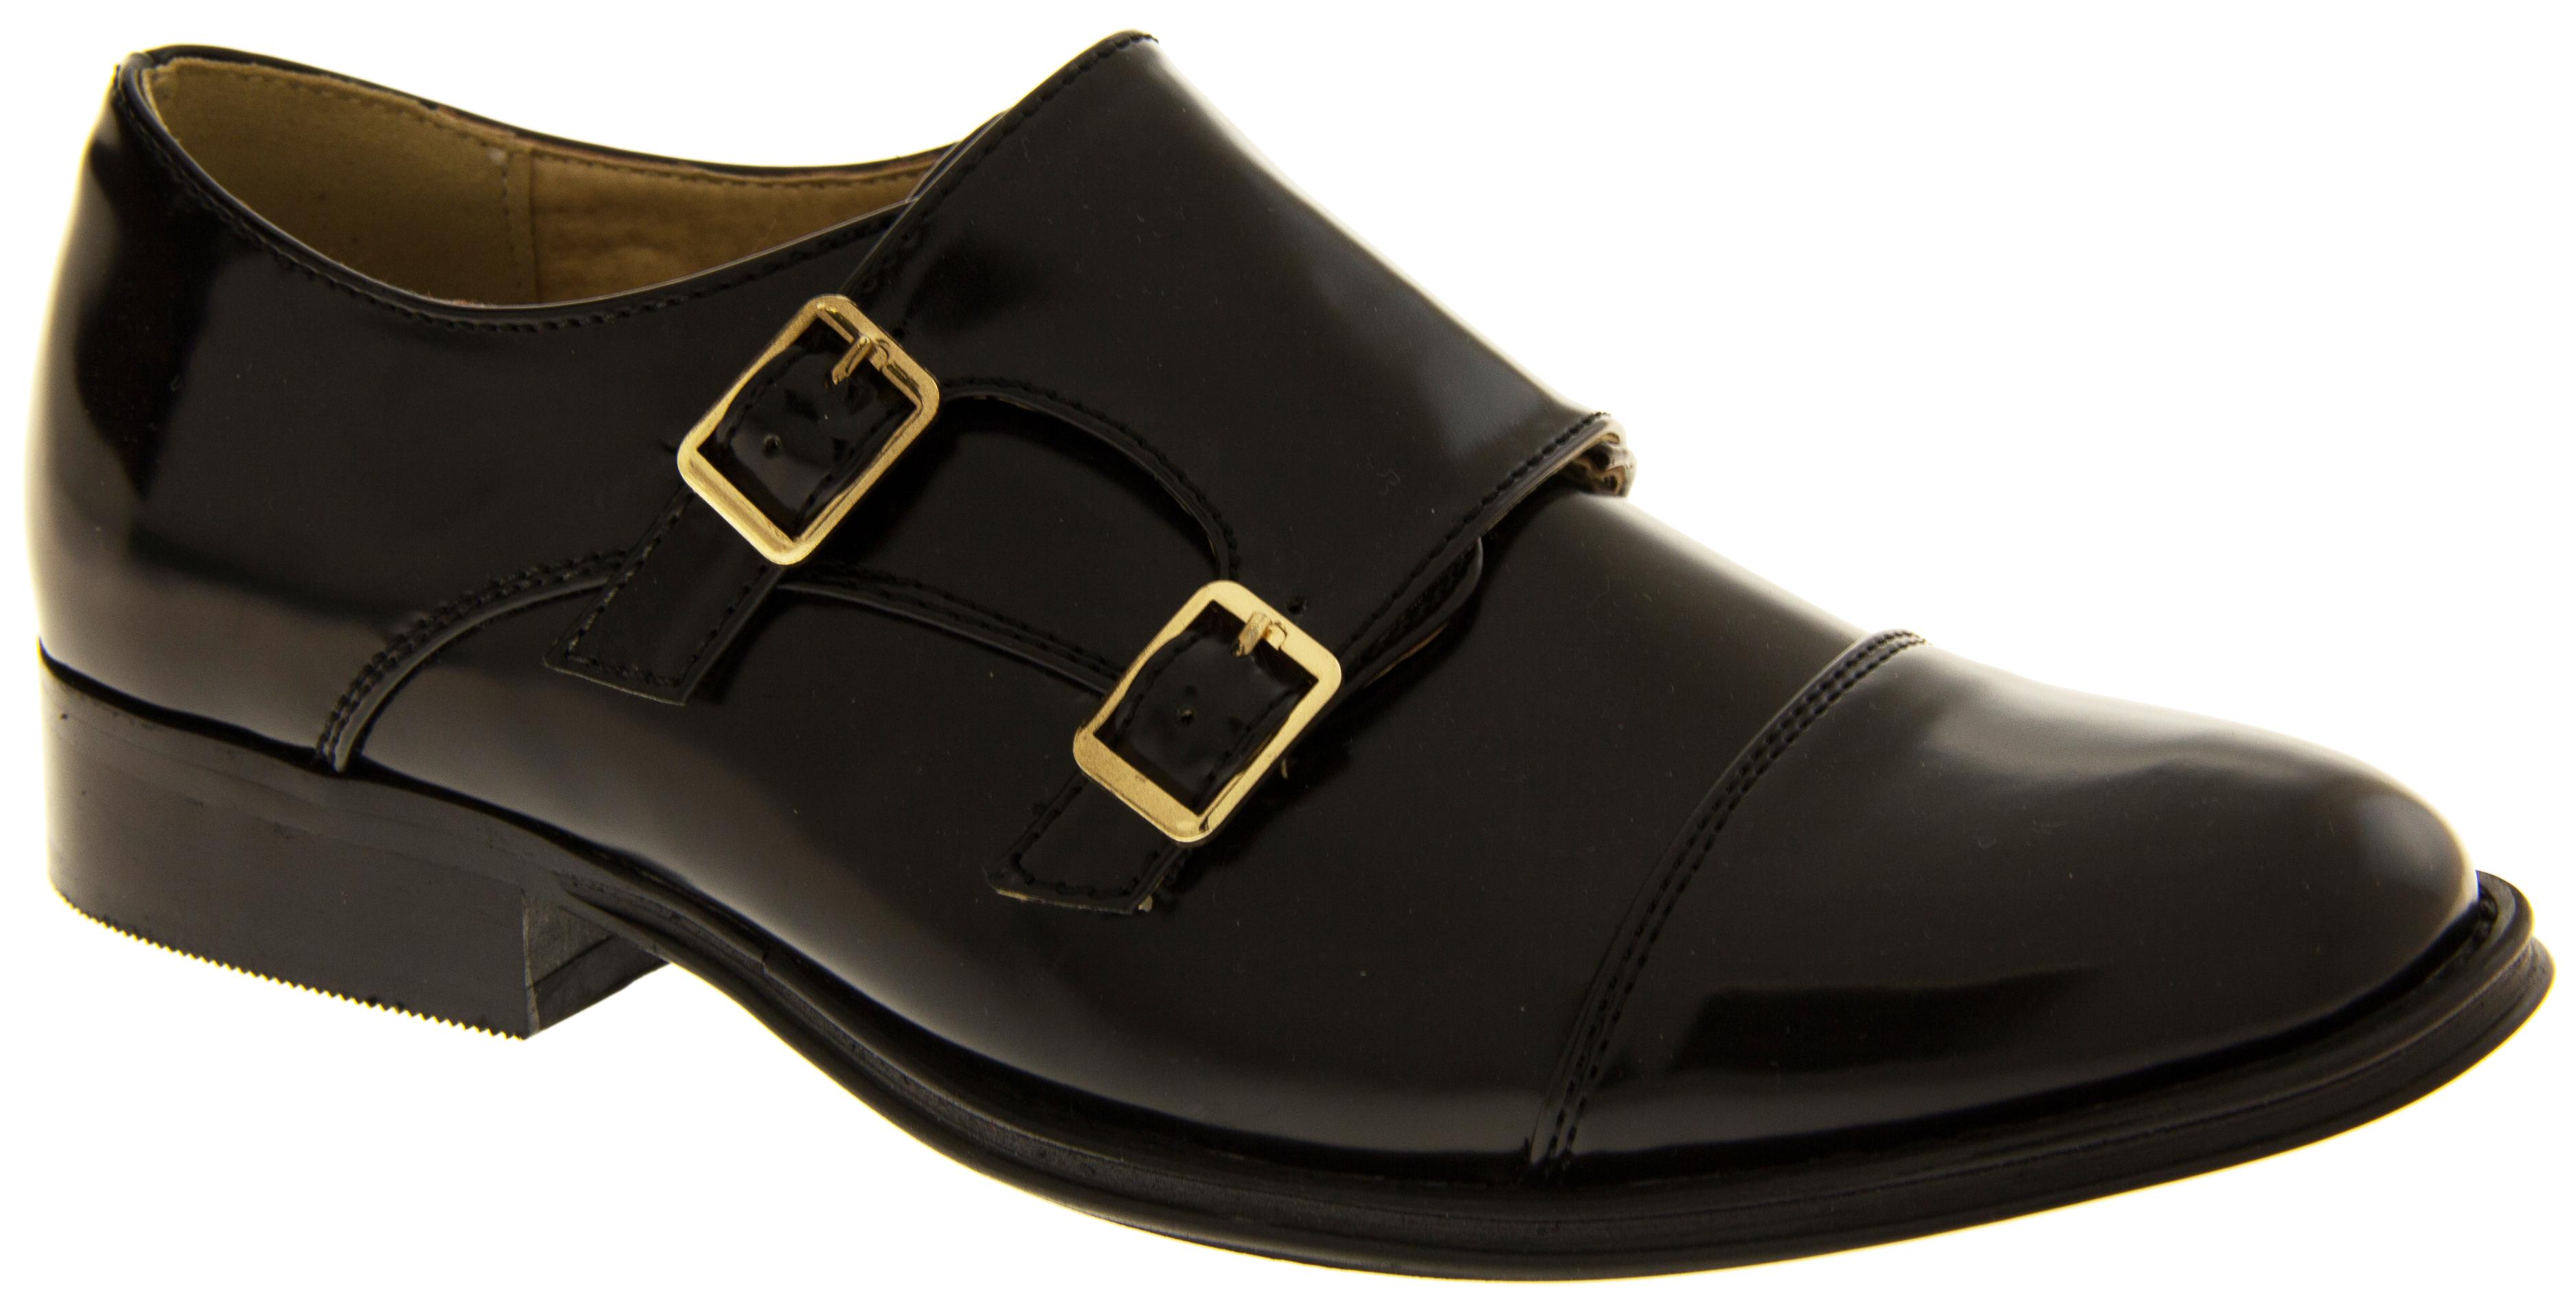 Ladies Monk Shoes Uk